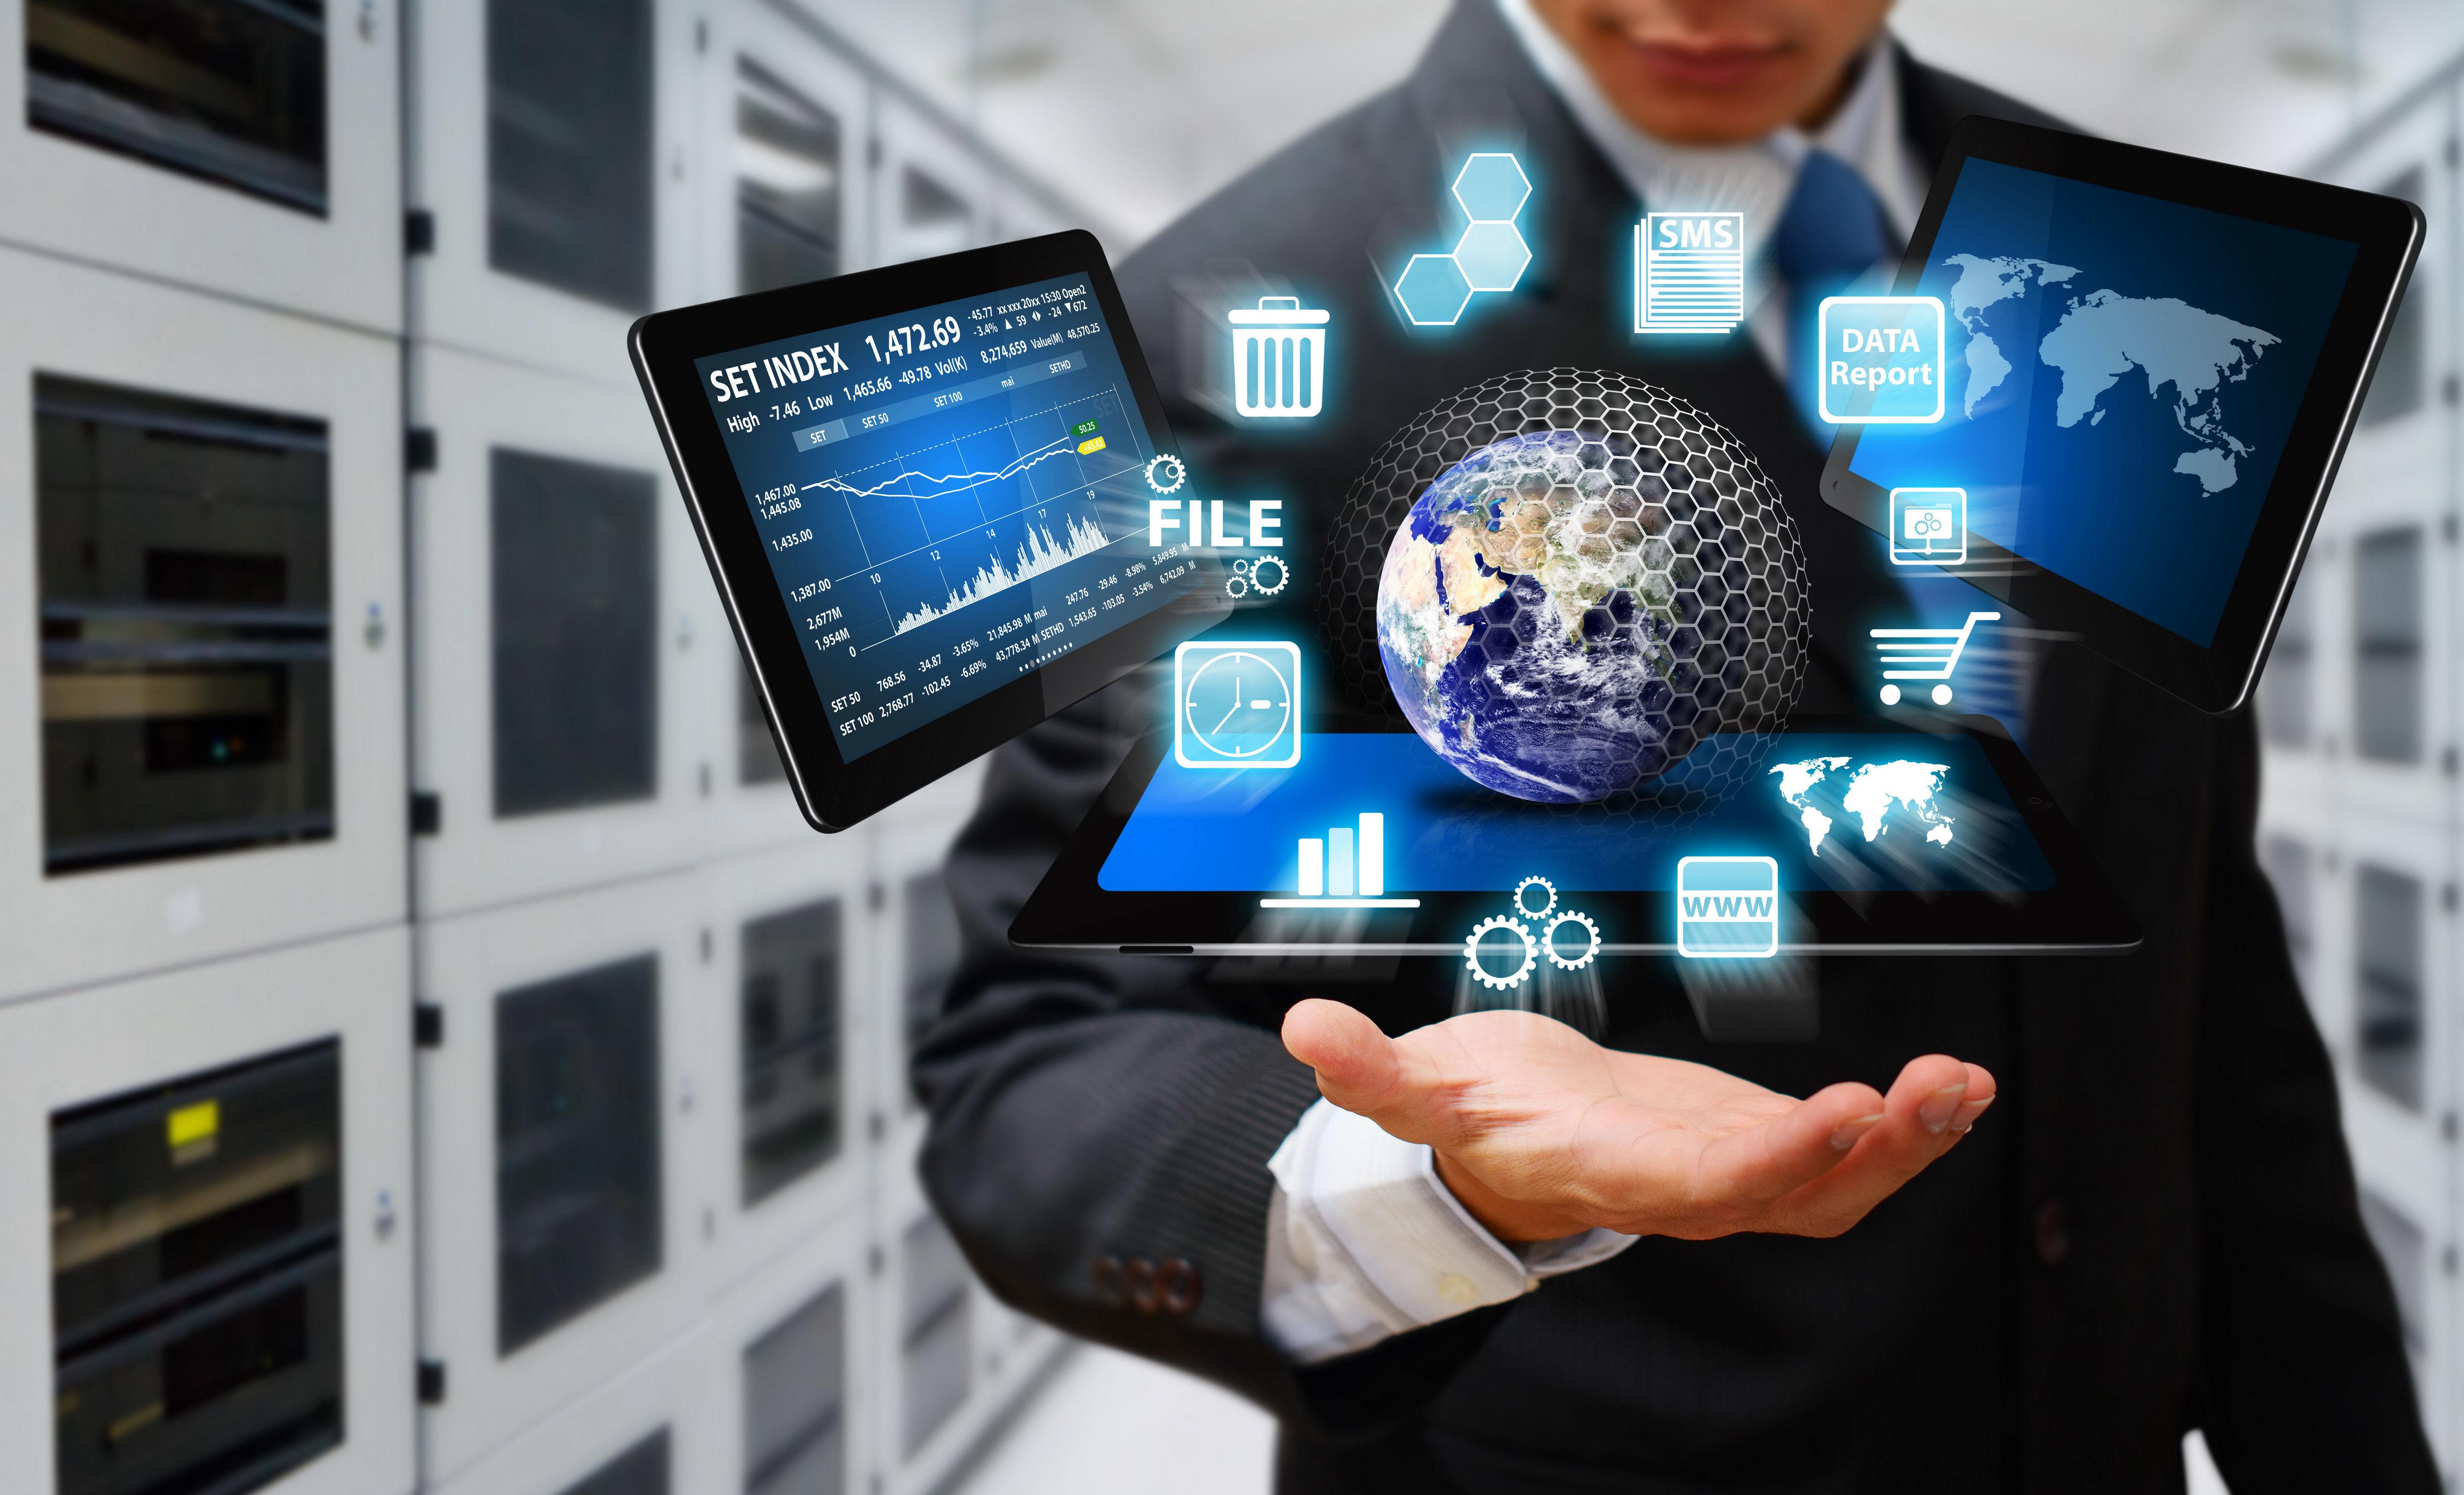 3d-secure: преимущества технологии и проблемы безопасности